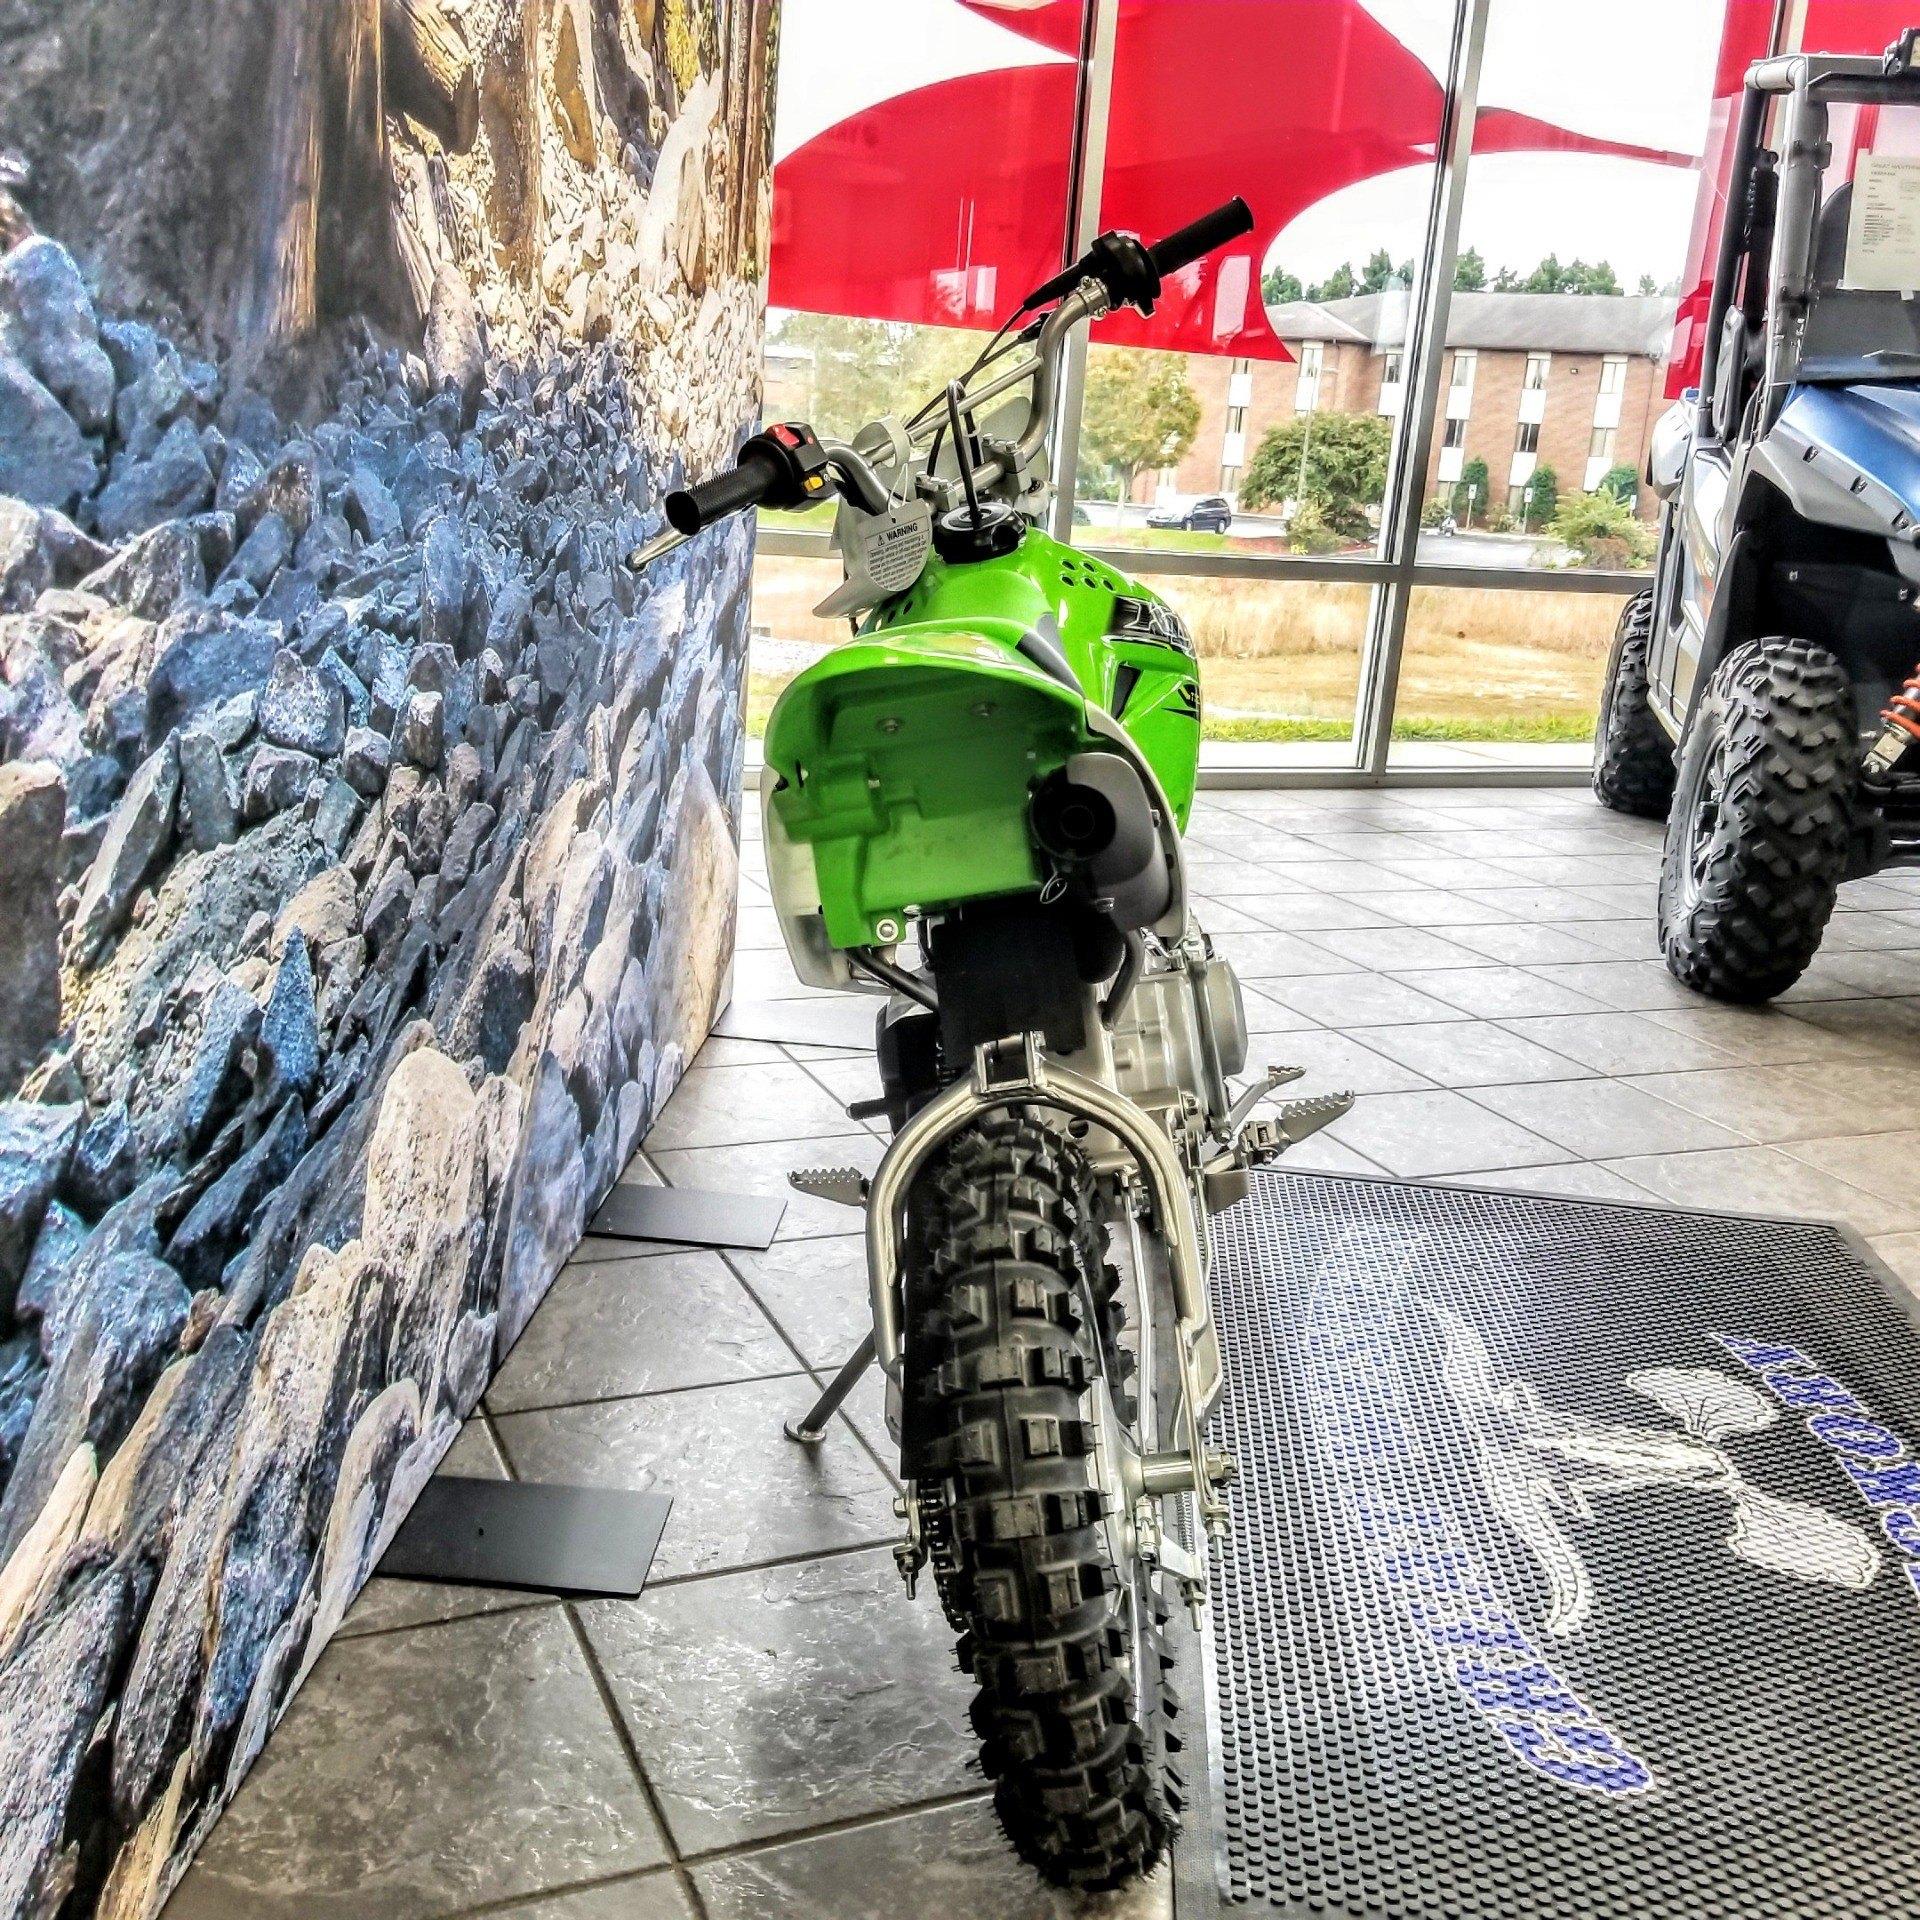 2019 Kawasaki KLX 110L in Hickory, North Carolina